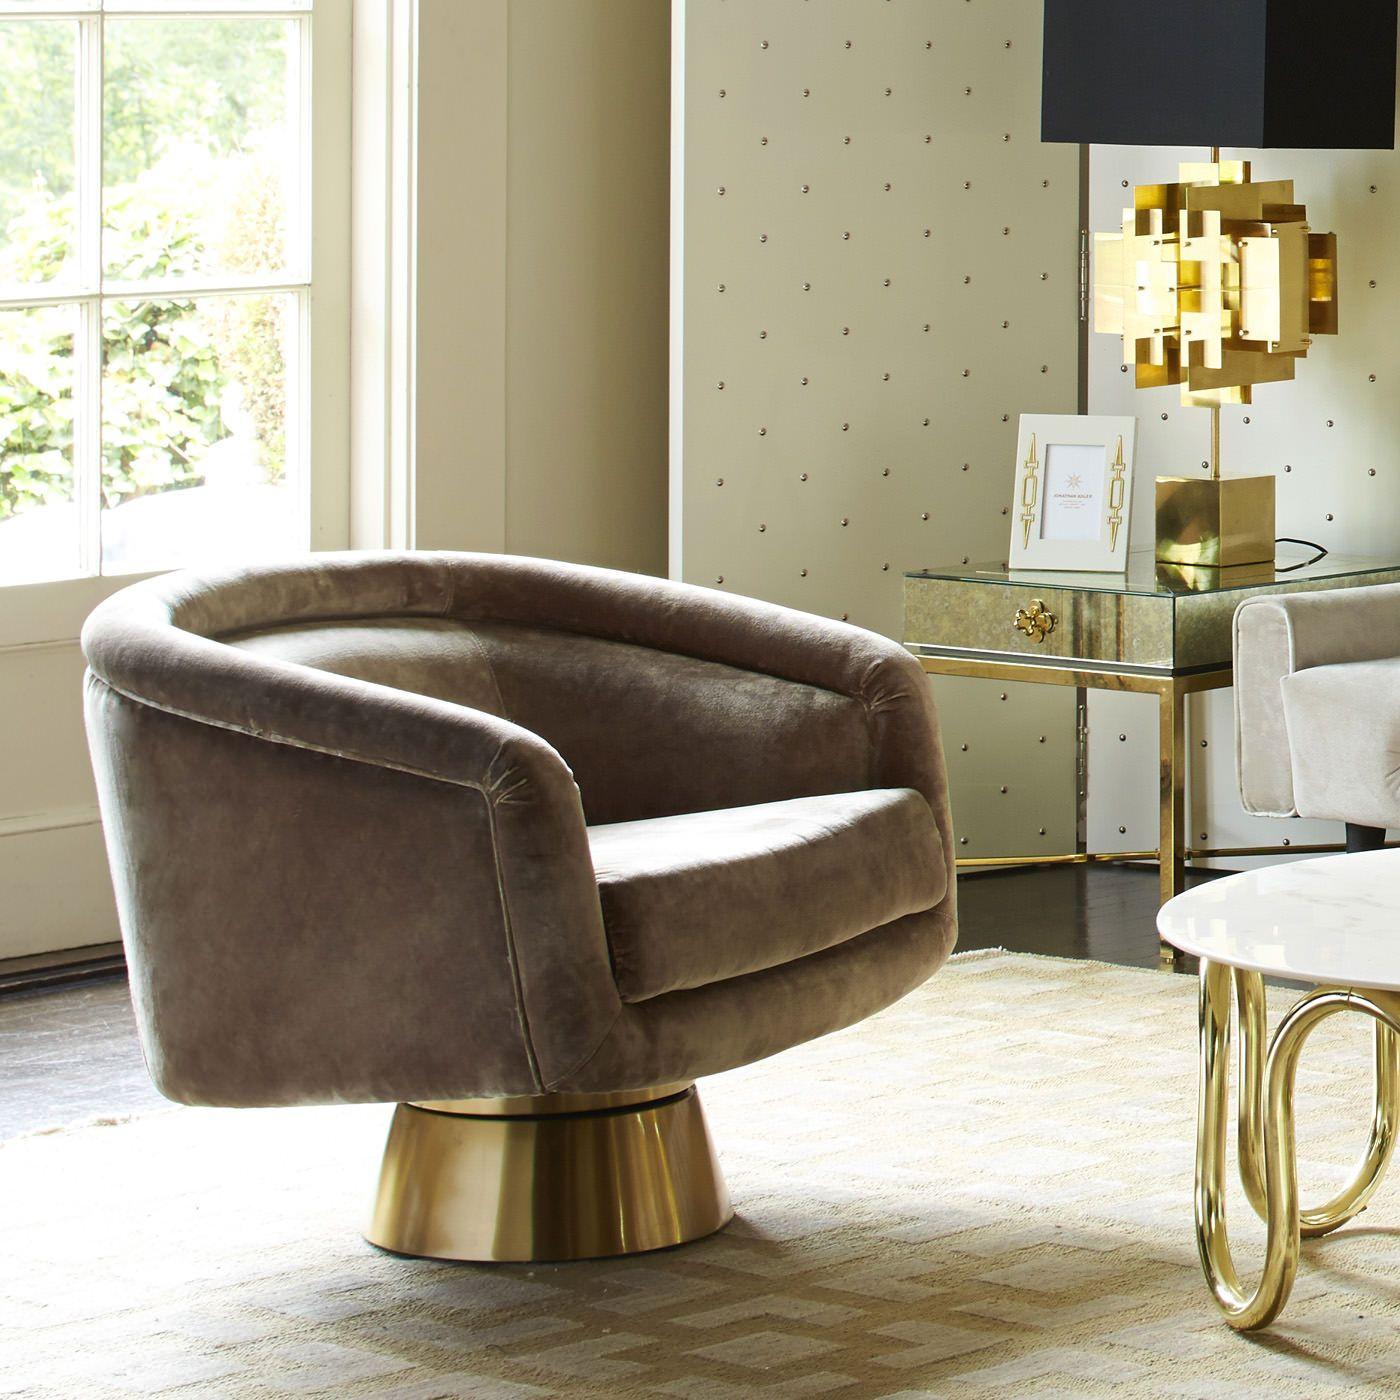 Bacharach Swivel Chair Swivel Chair Upholstered Swivel Chairs